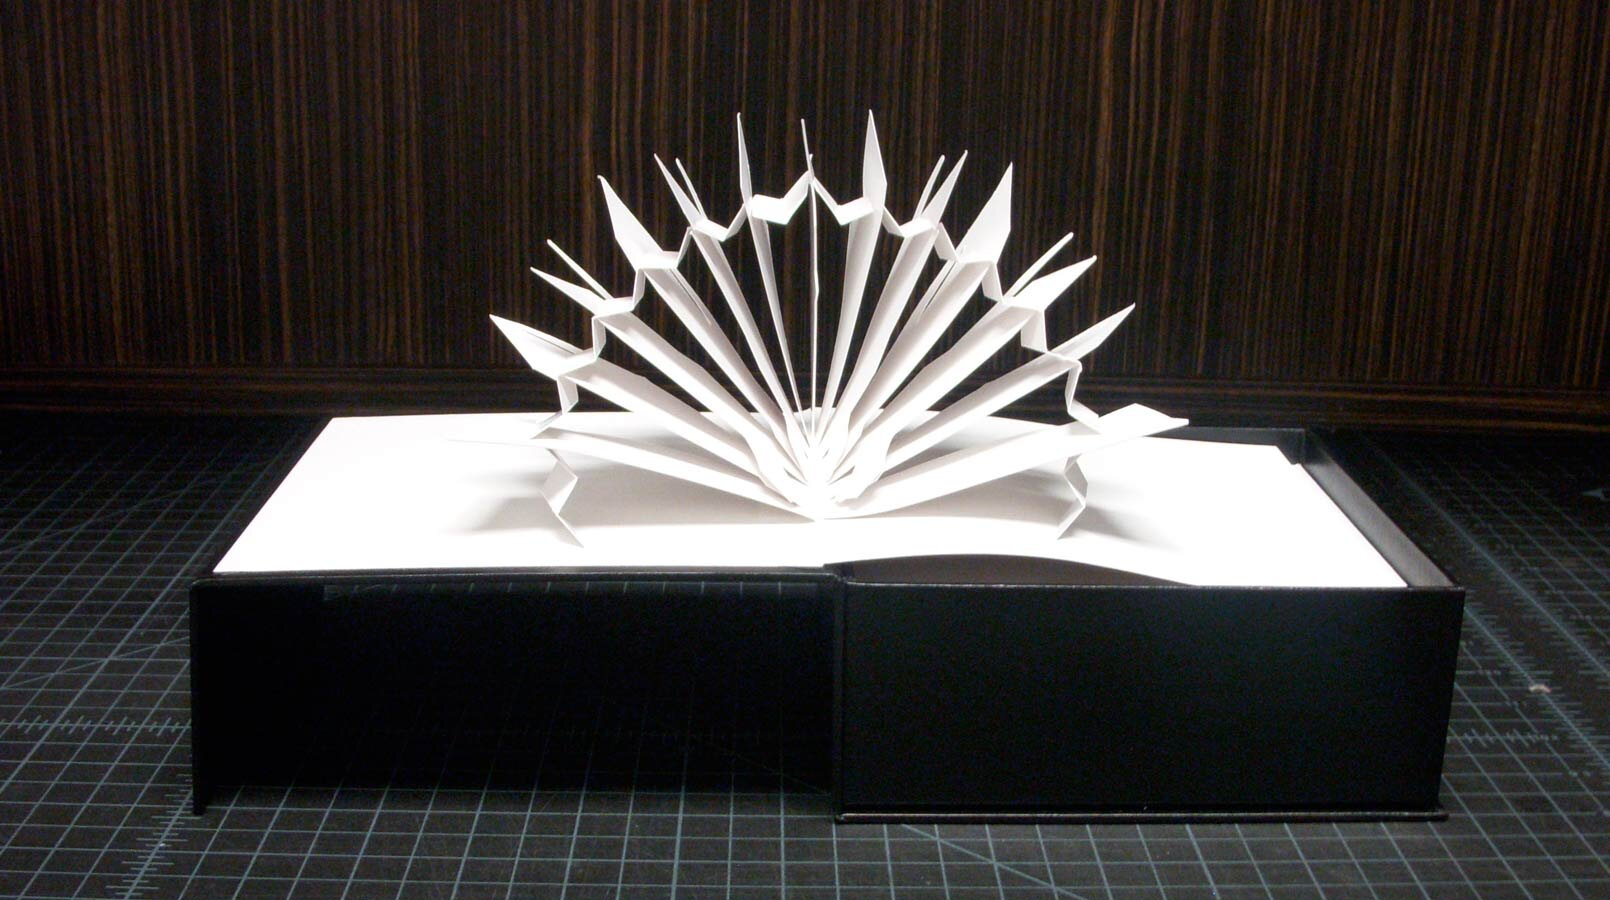 Barneys-New-York-Lady-Gaga-Design-Packaging-3.4.jpg